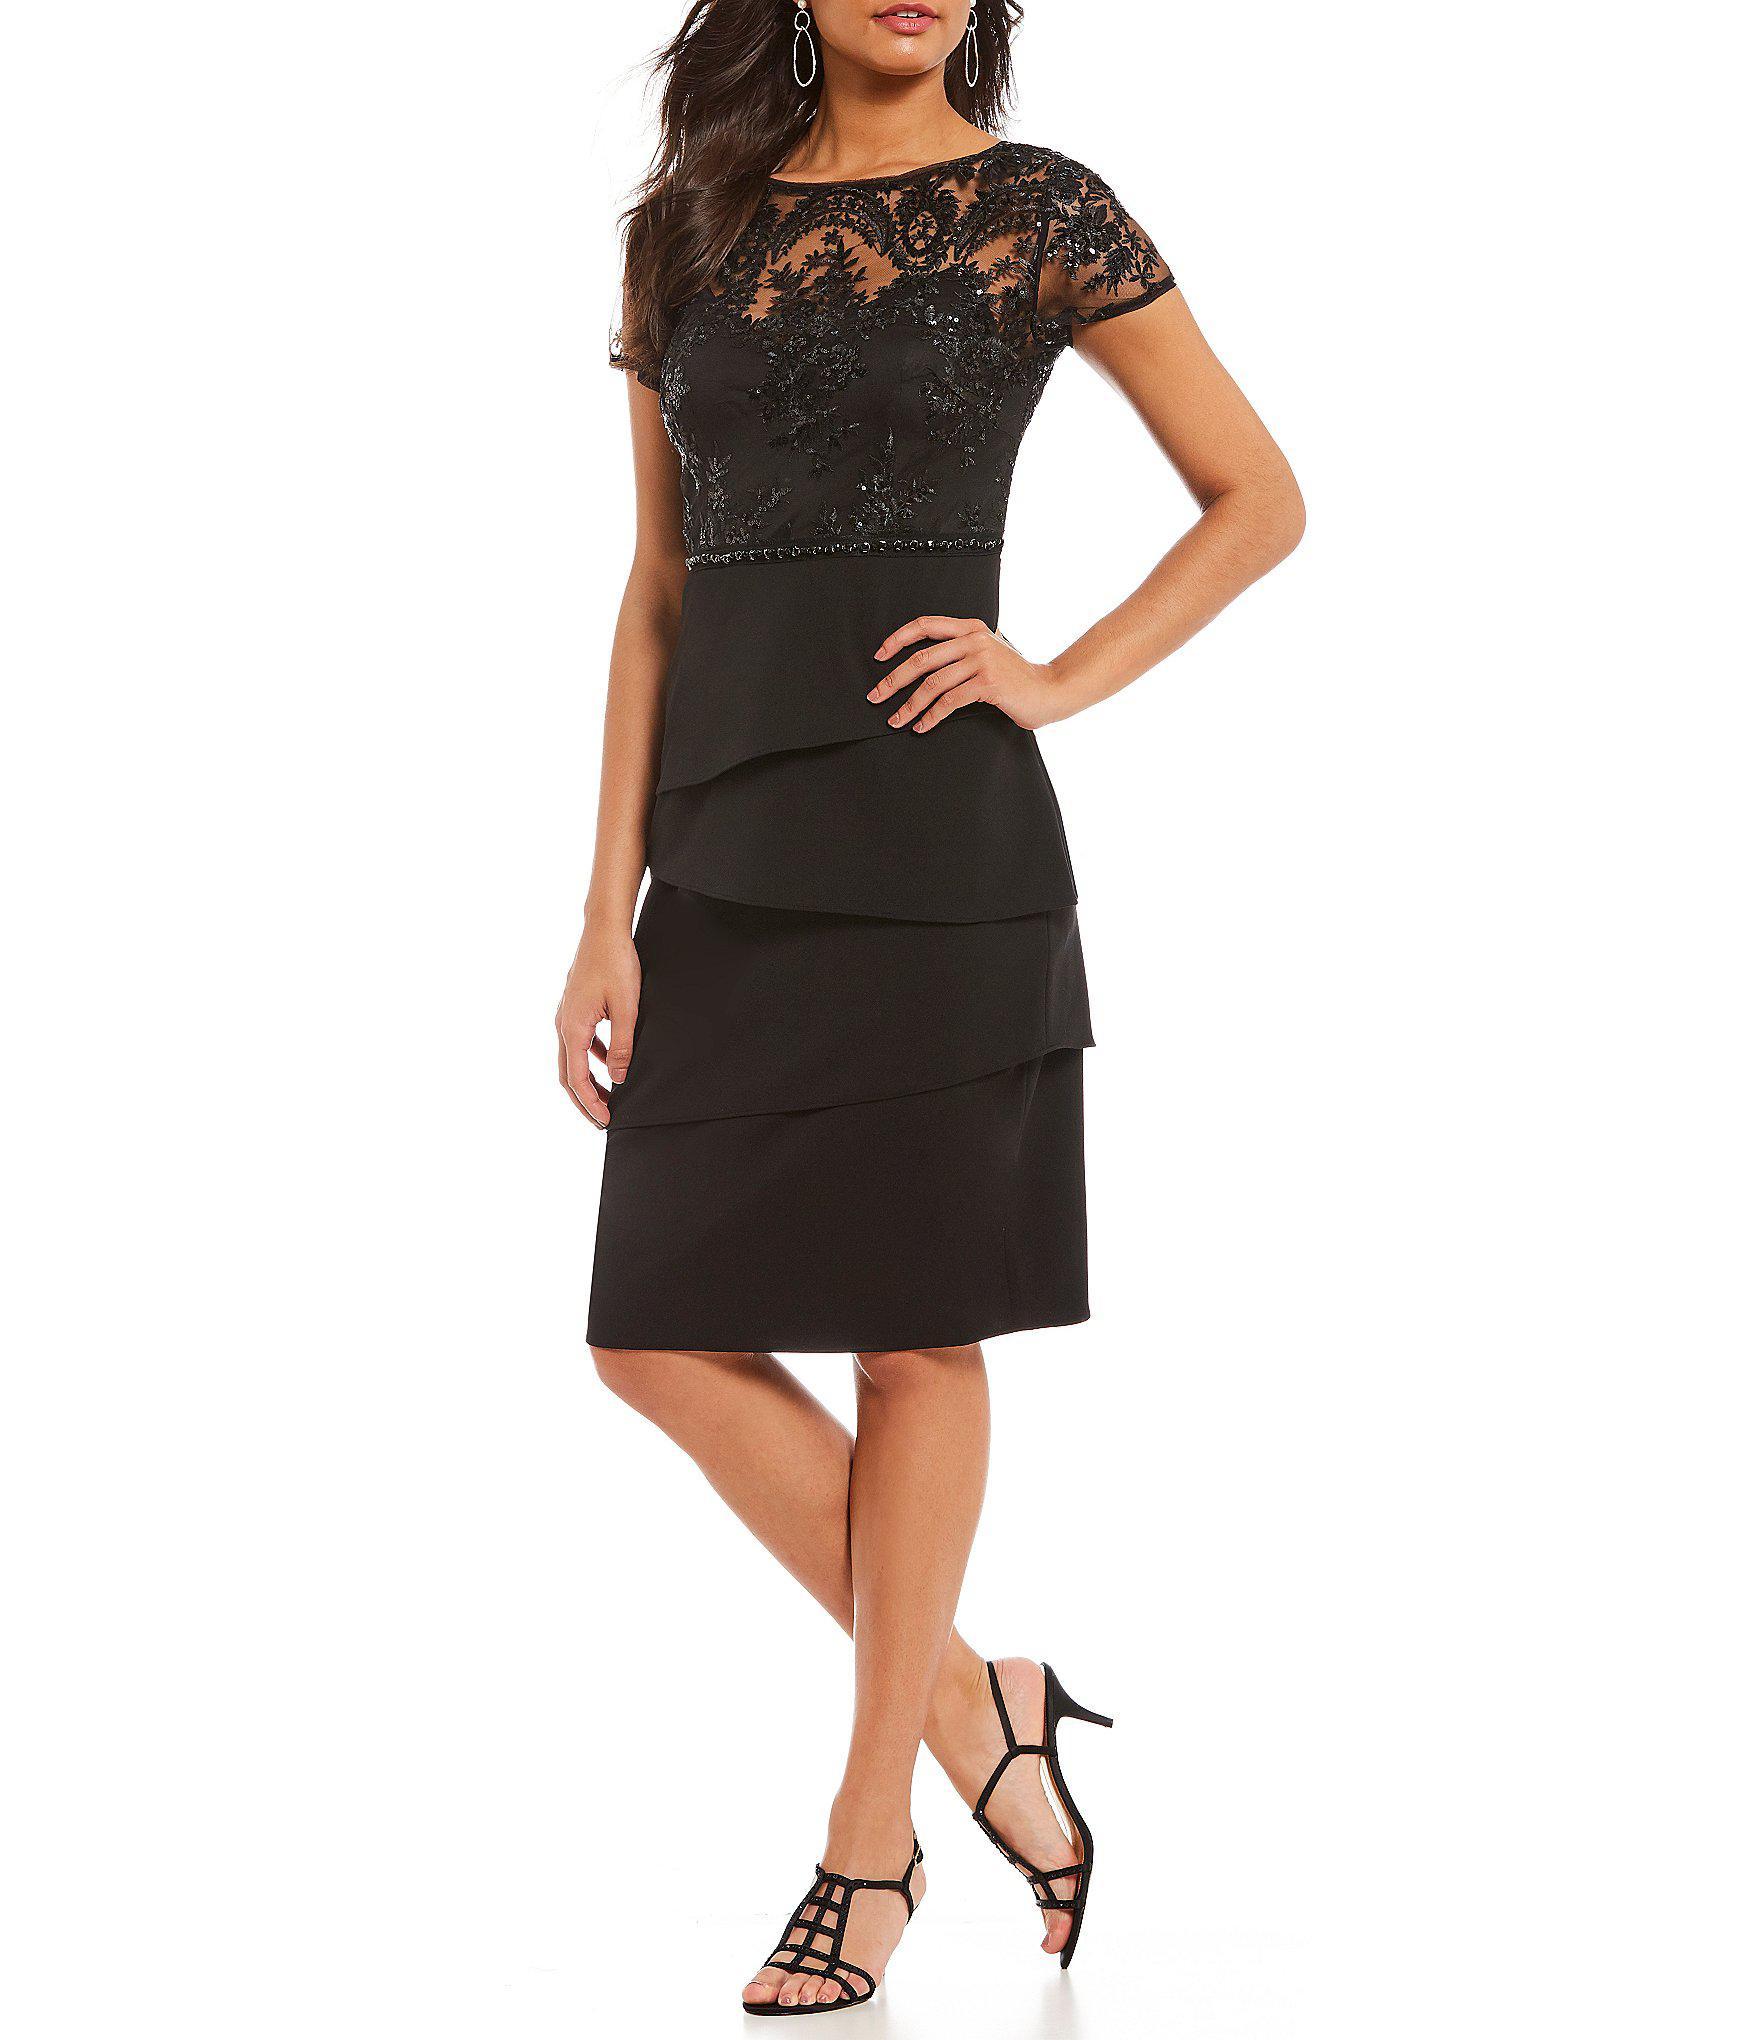 5a6e838e2e Adrianna Papell. Women's Black Petite Short Sleeve Sequin Bodice Tiered  Dress